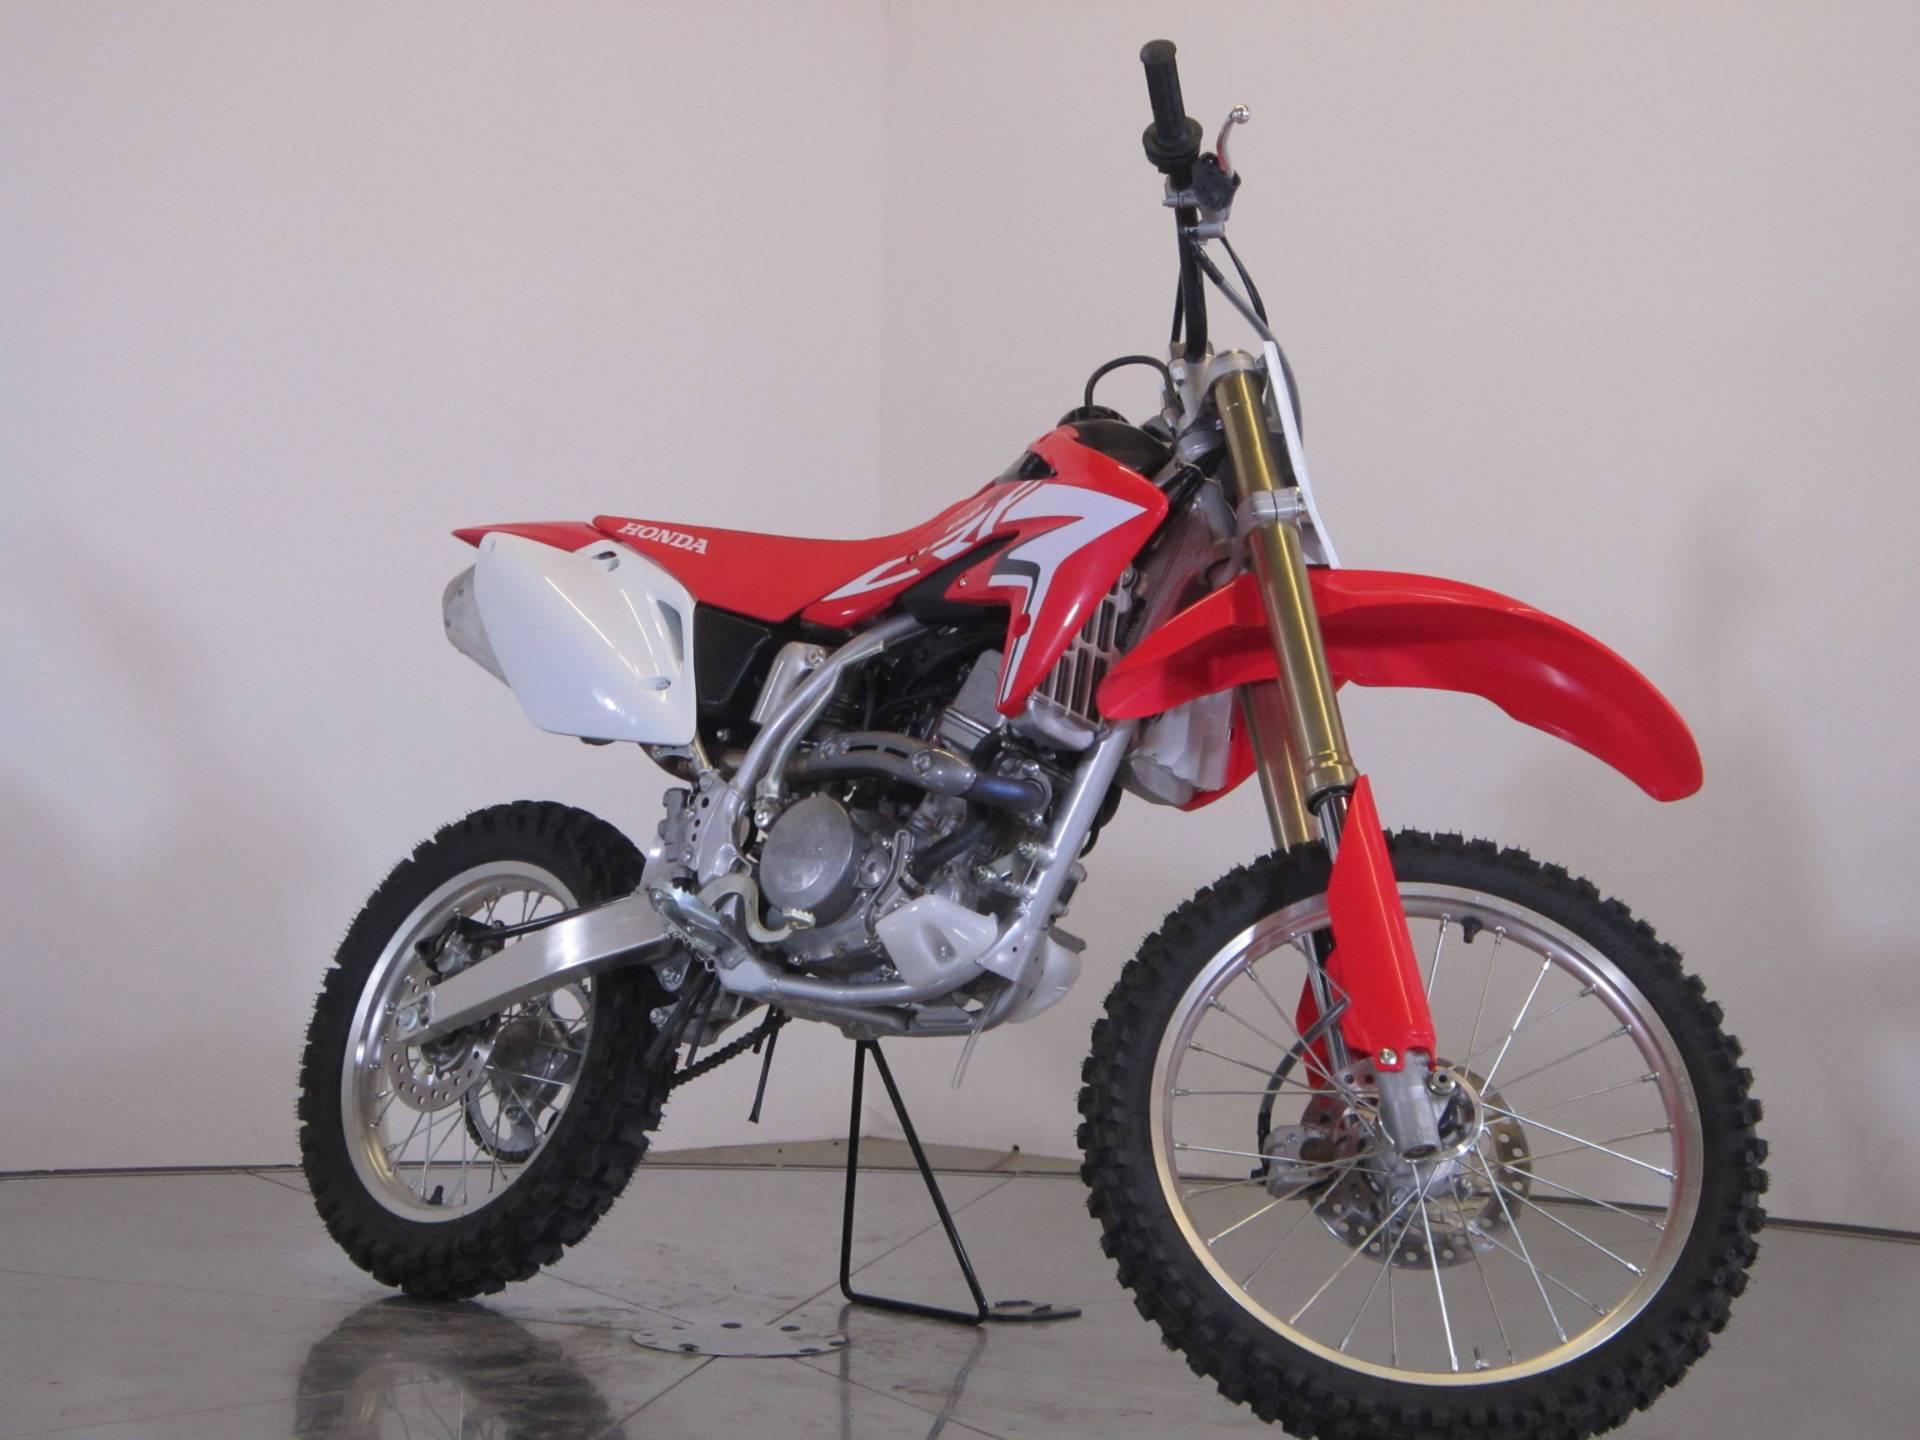 Used 2018 Honda CRF150R Expert Motorcycles in Greenwood Village CO